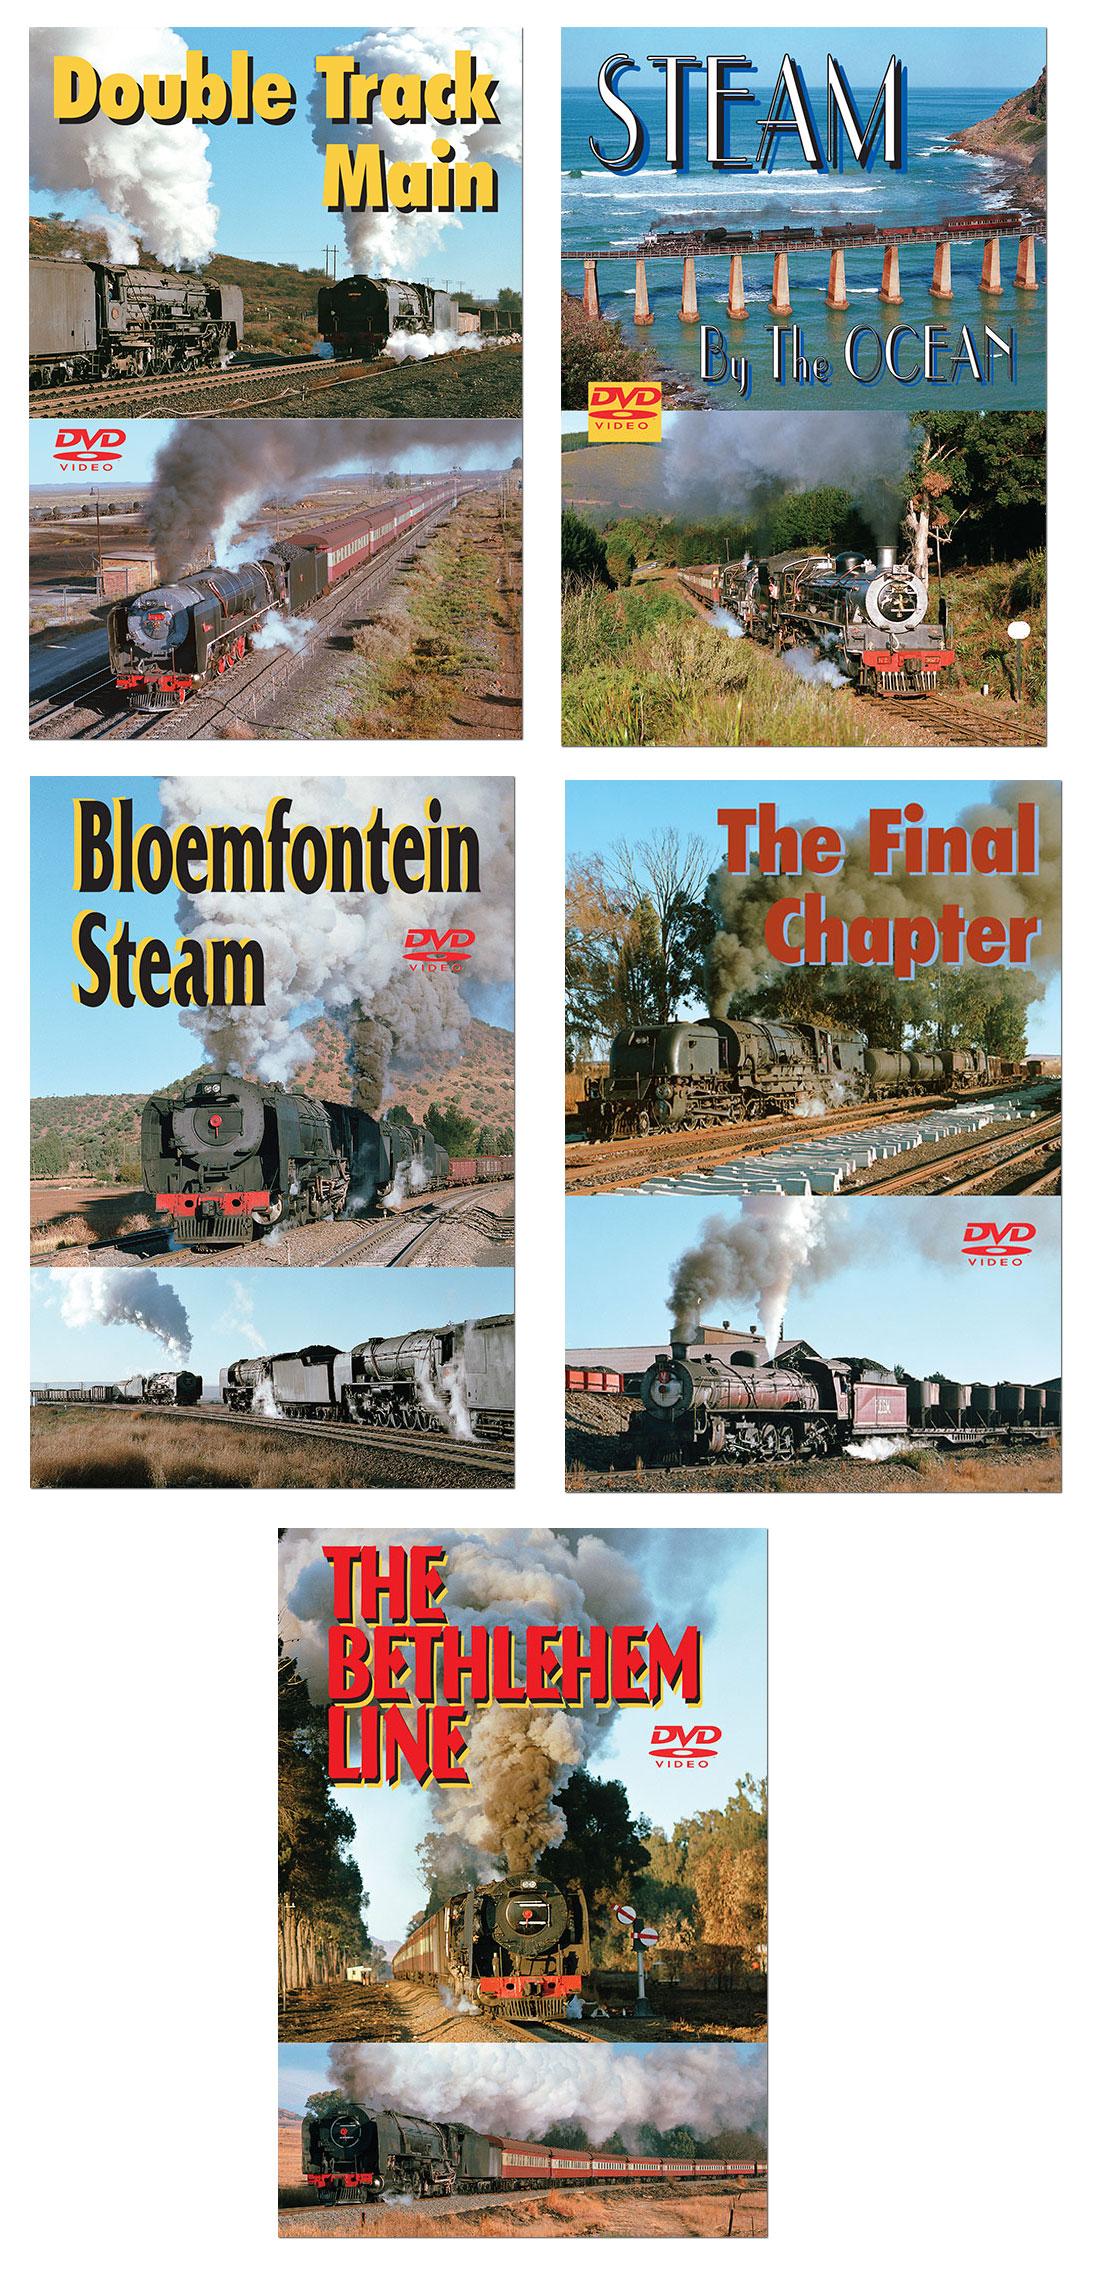 South African Steam 5 DVD Set by Greg Scholl Train Video Greg Scholl Video Productions GSVP-SAFSET